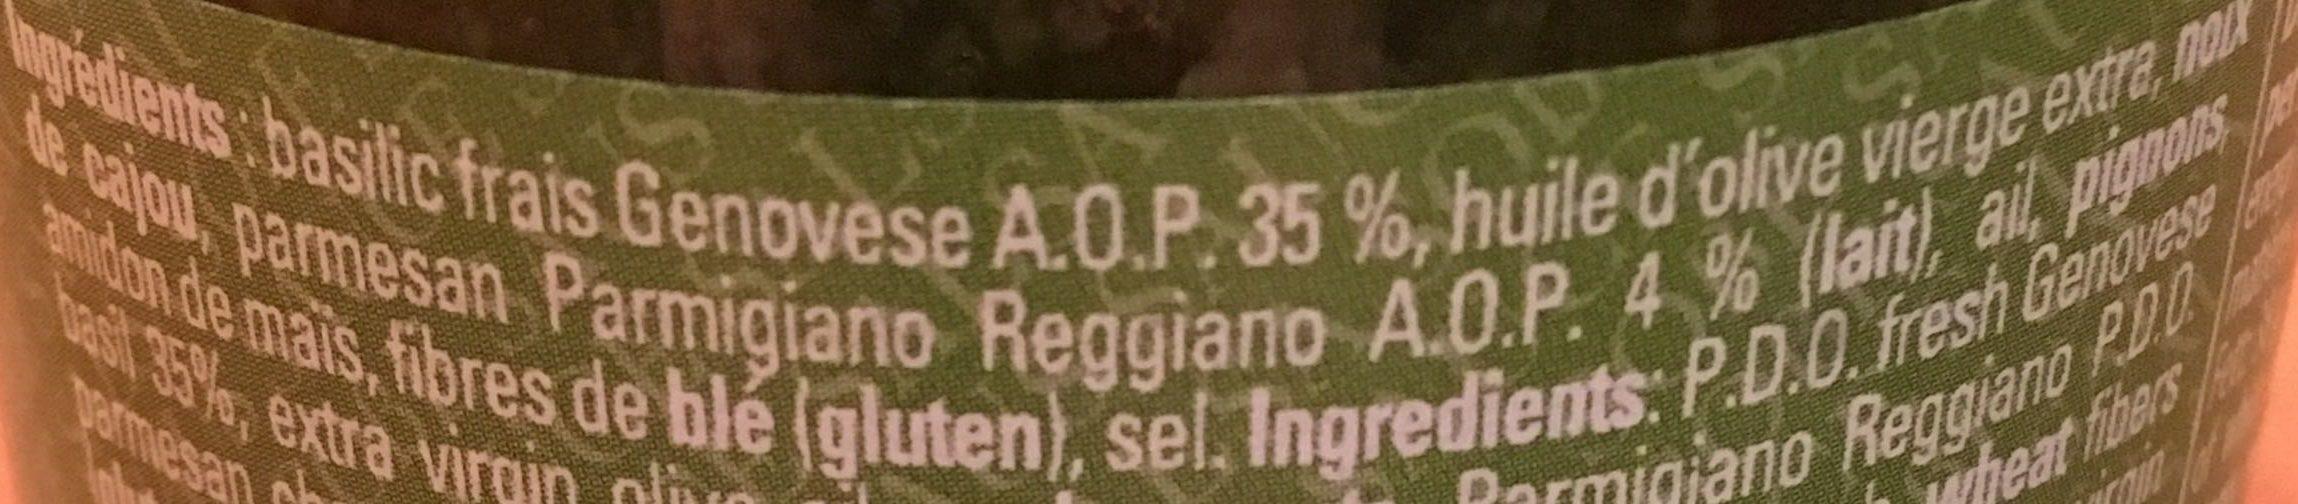 Pesto alla genovese - Ingrédients - fr